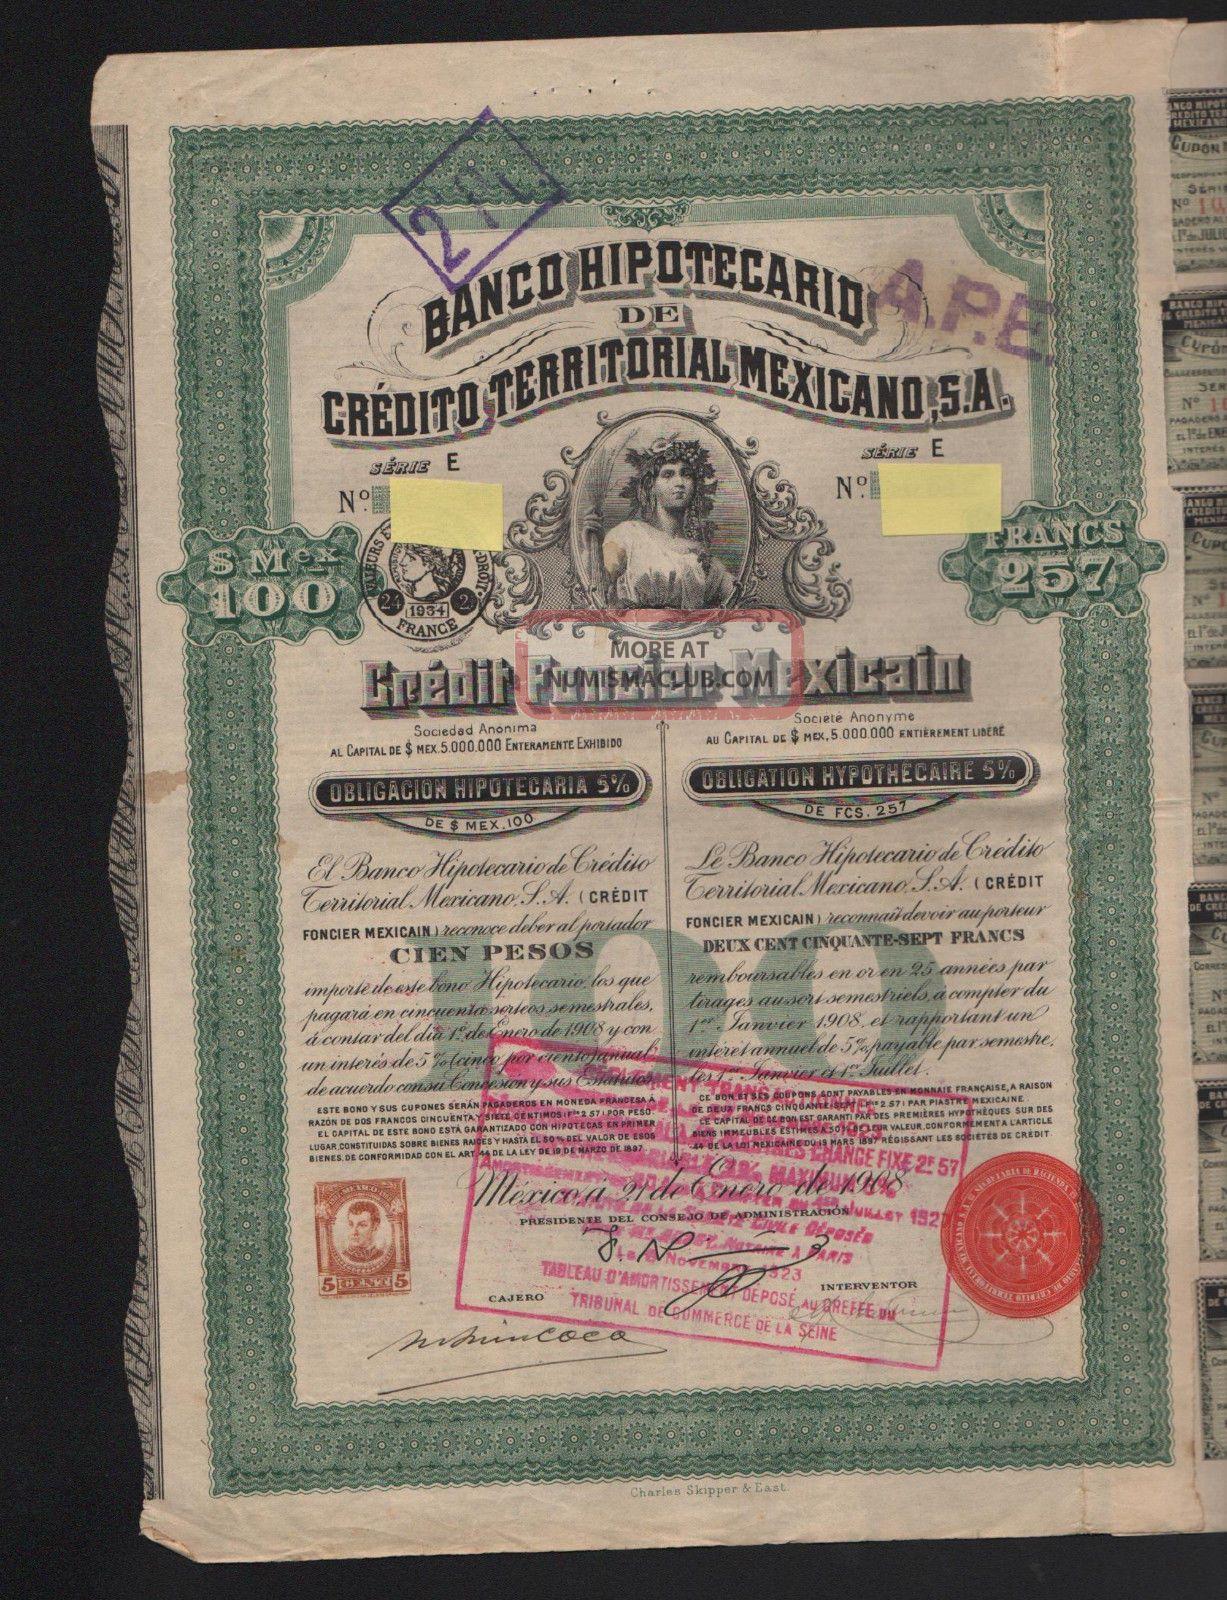 Obligacion: Banco Hypotecario De Credito Territoral Mexicano 1908 Stocks & Bonds, Scripophily photo